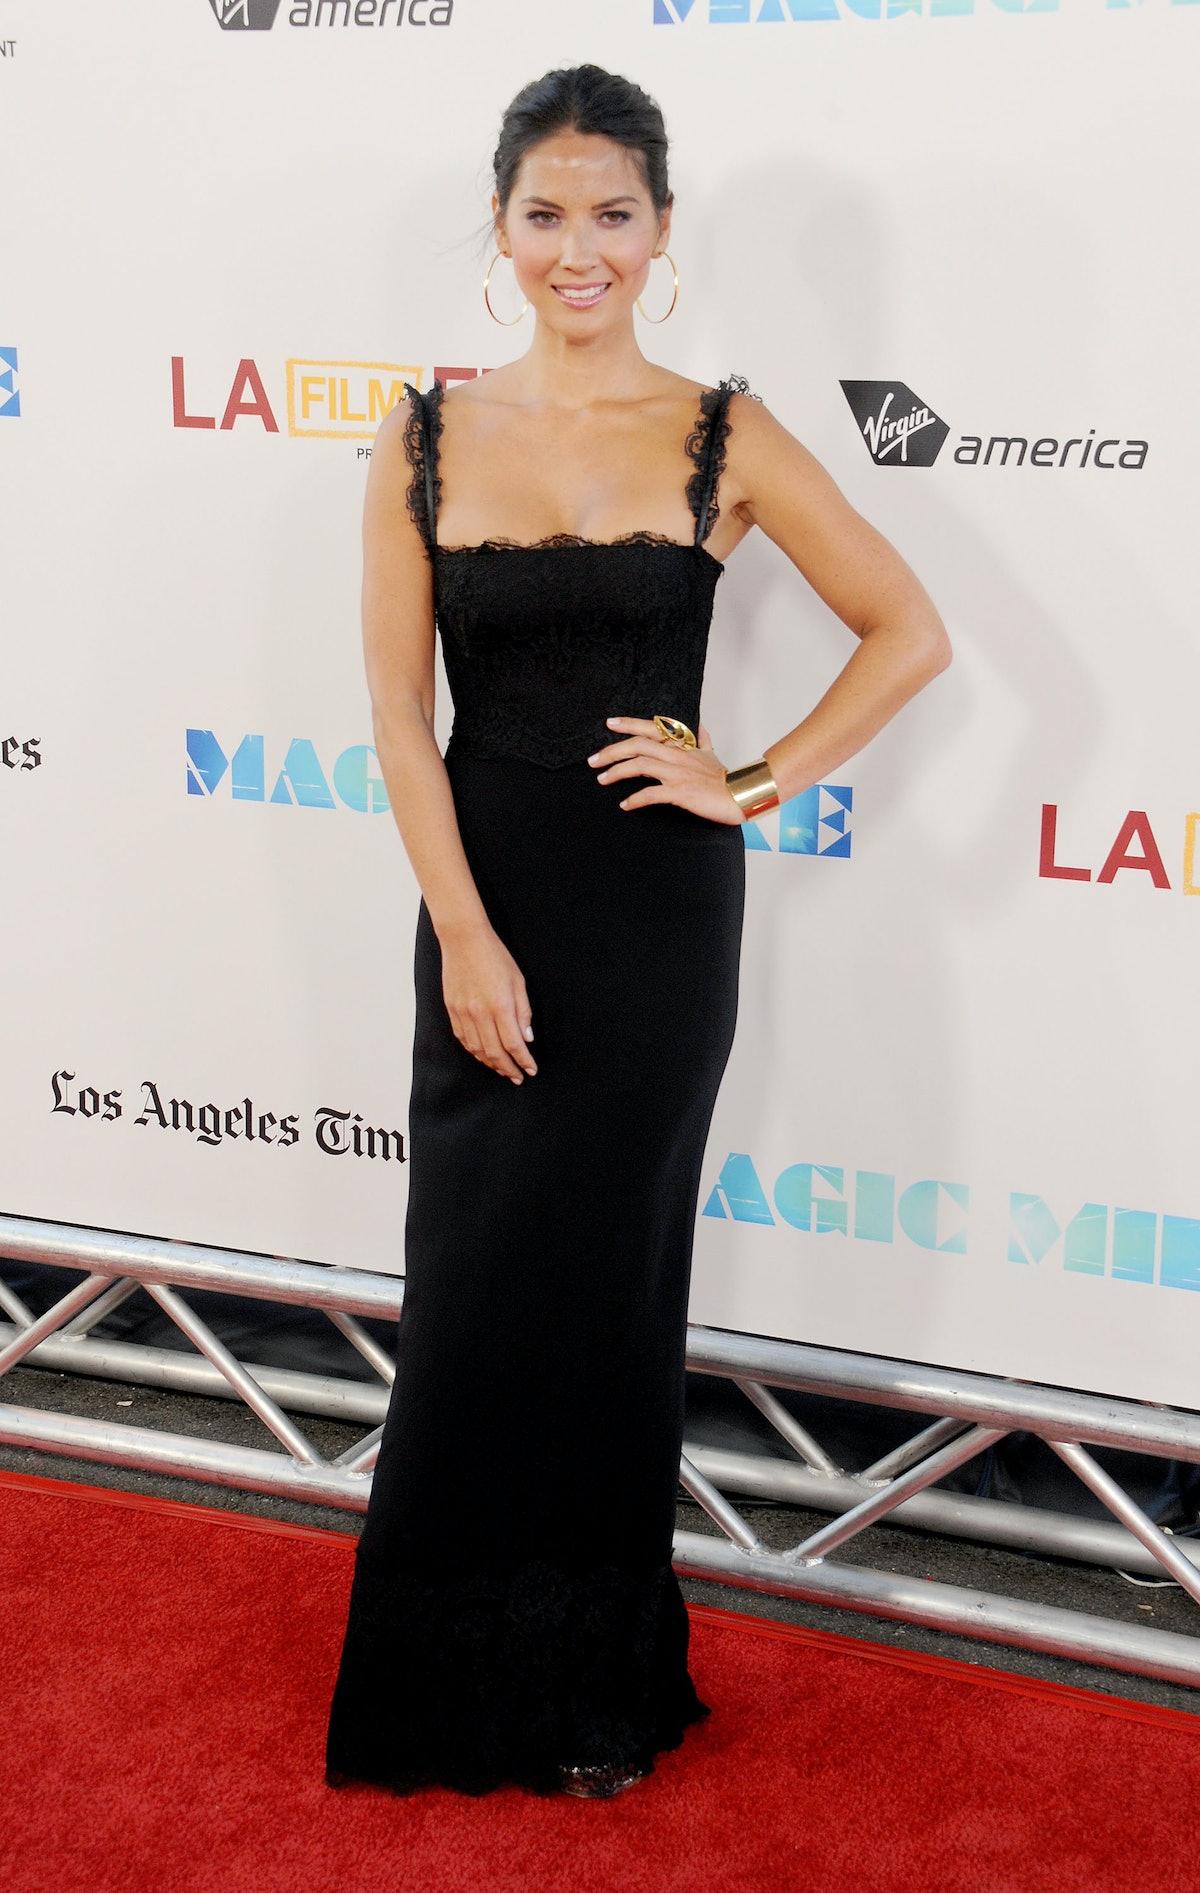 "2012 Los Angeles Film Festival - Closing Night Gala Premiere ""Magic Mike"" - Arrivals"